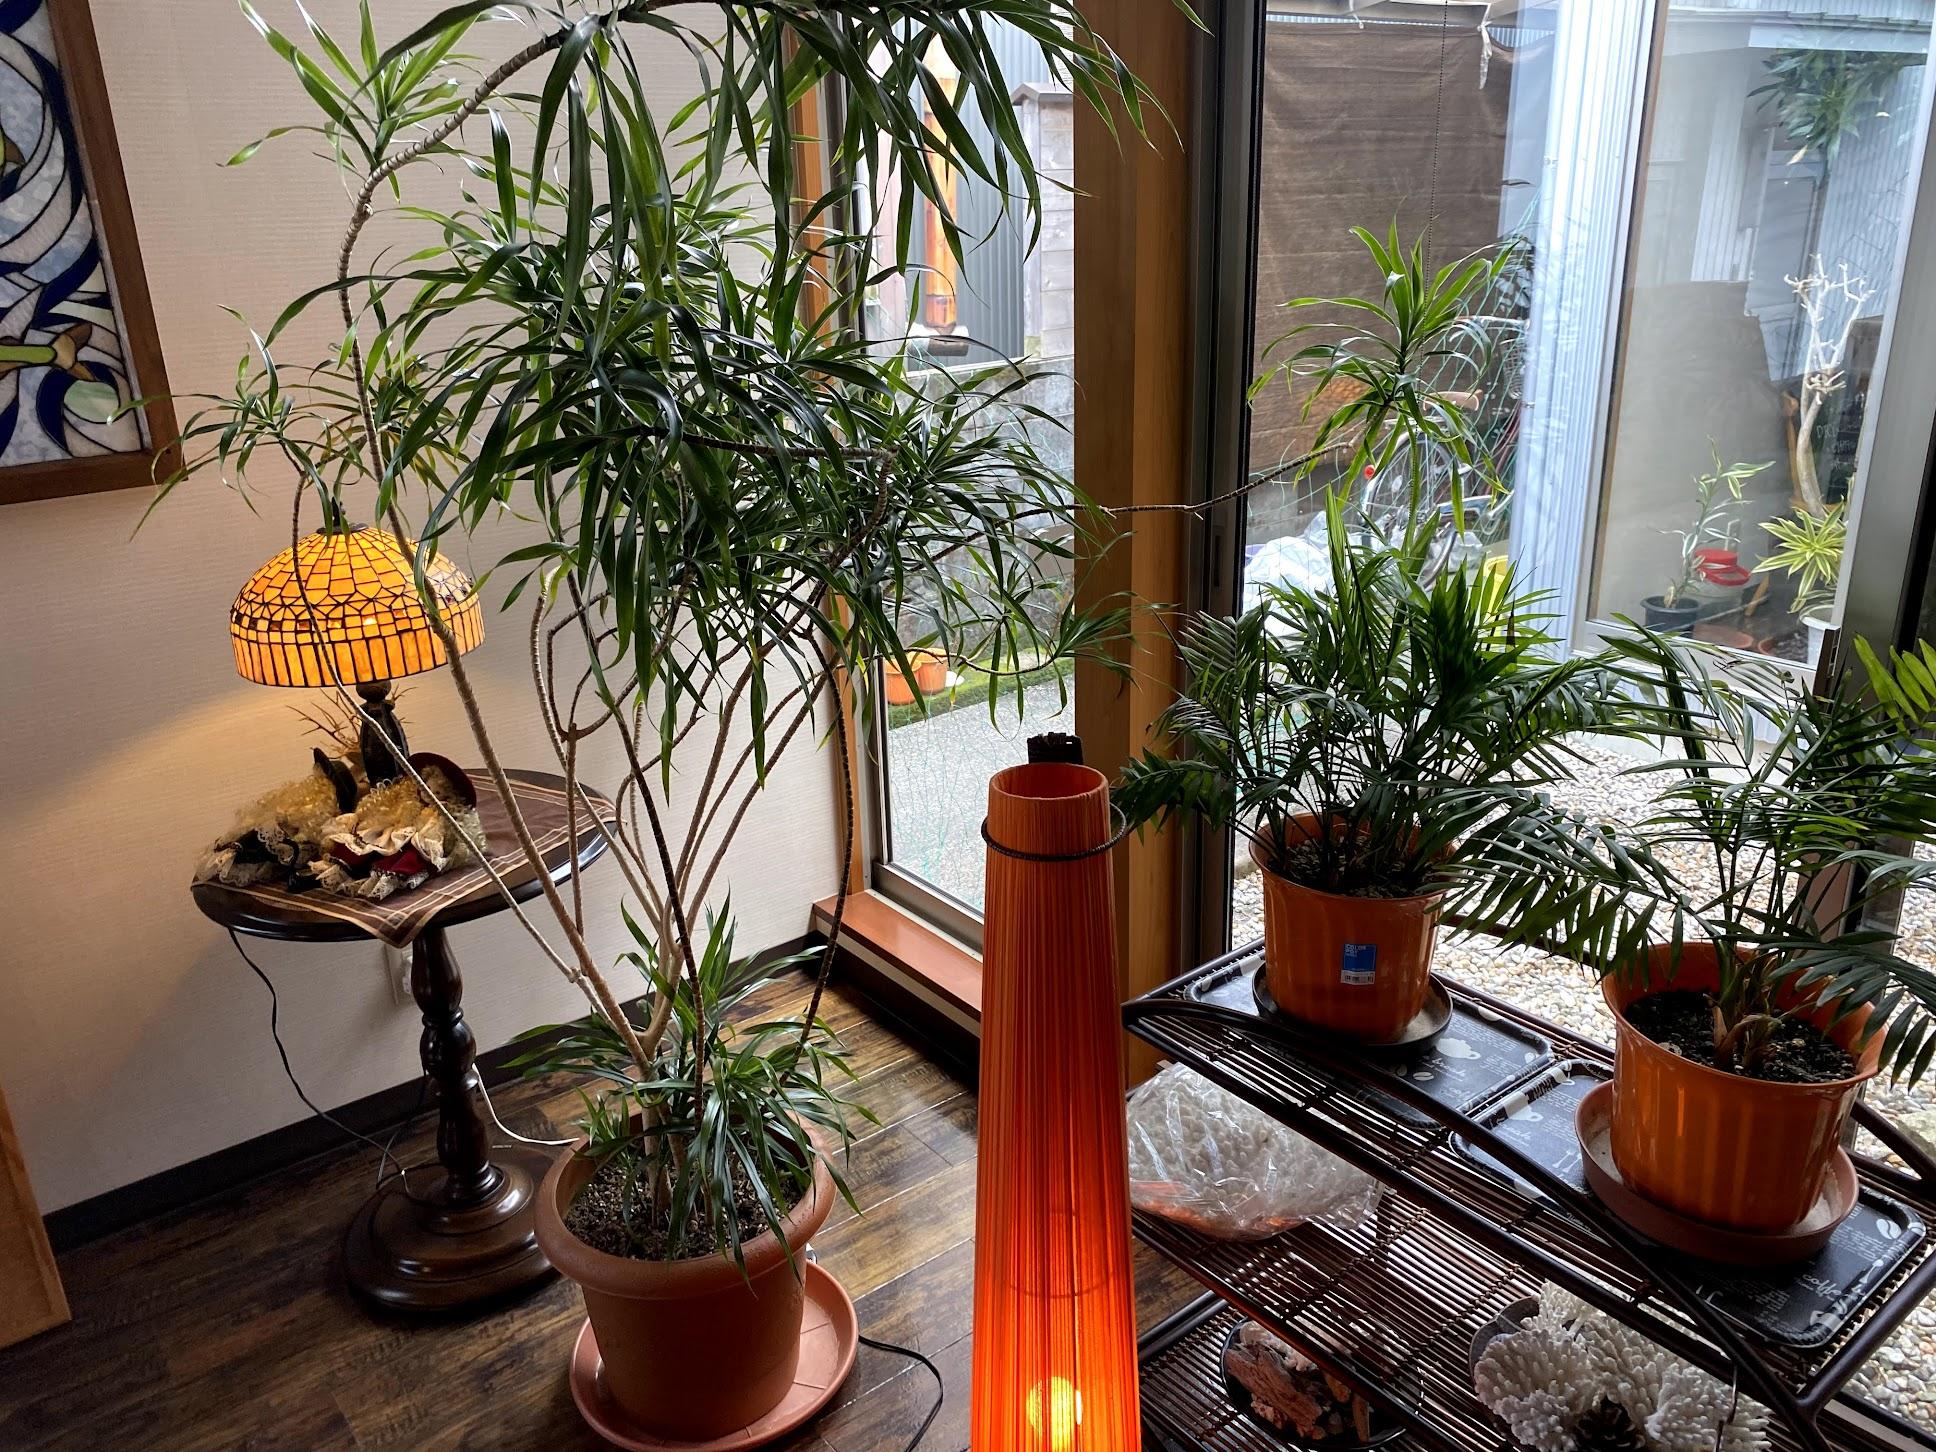 味覚 店内の様子 植物